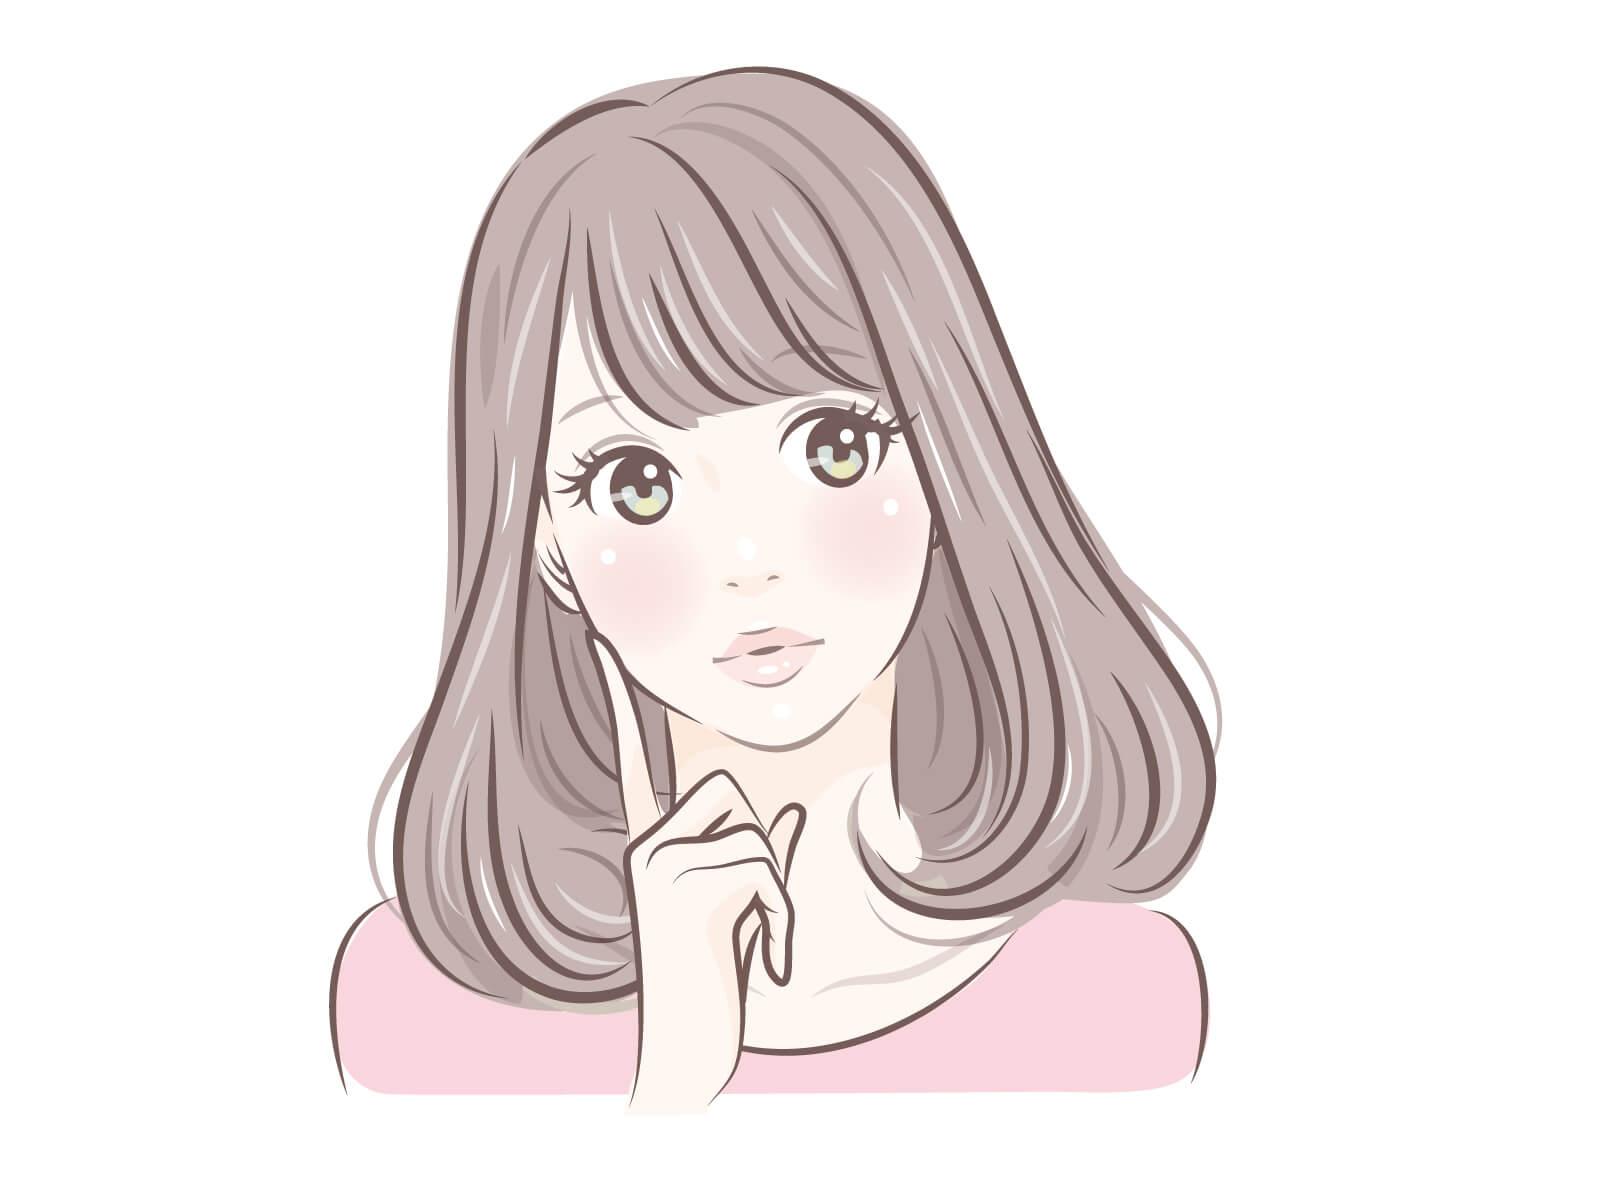 https://girlswalker.com/beautywalker/wp-content/uploads/42b12ca897b10277d15d67f32a3d14da56bd397aacf569def7527aa01e9290e9.jpg